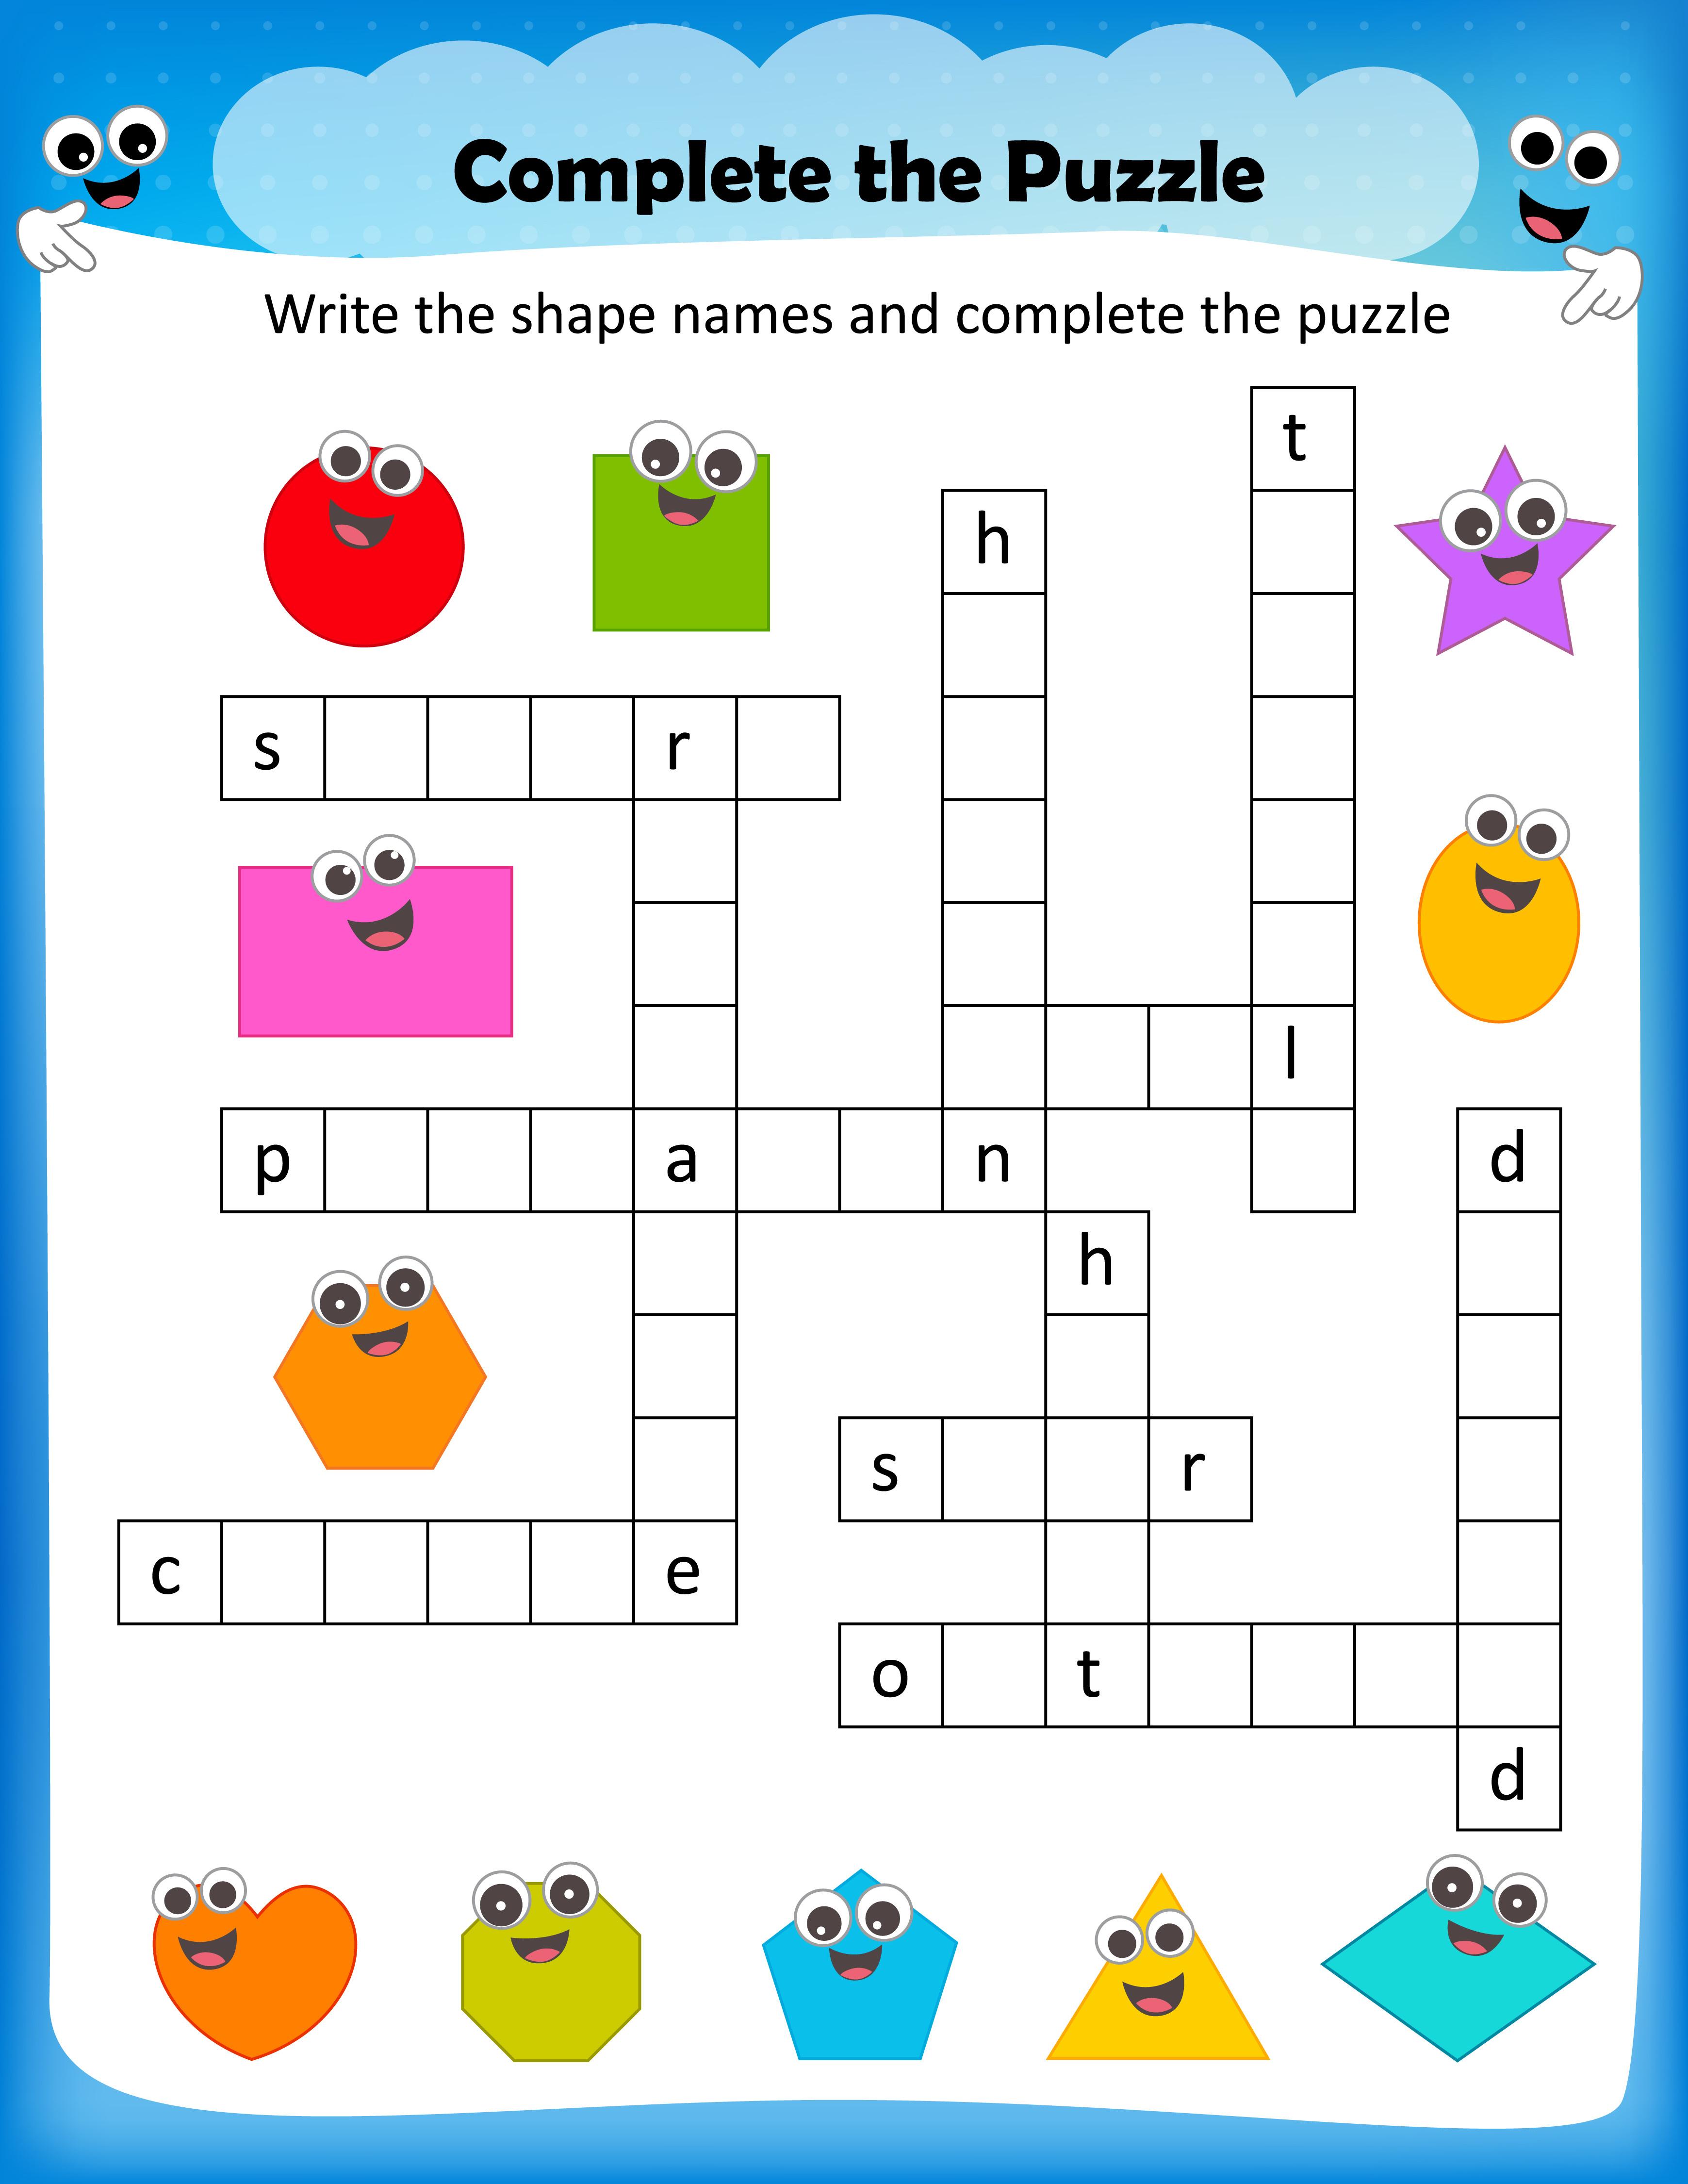 Free Printable Crosswords With Top 10 Benefits For Our Kids - Free Printable Crossword Puzzles Health